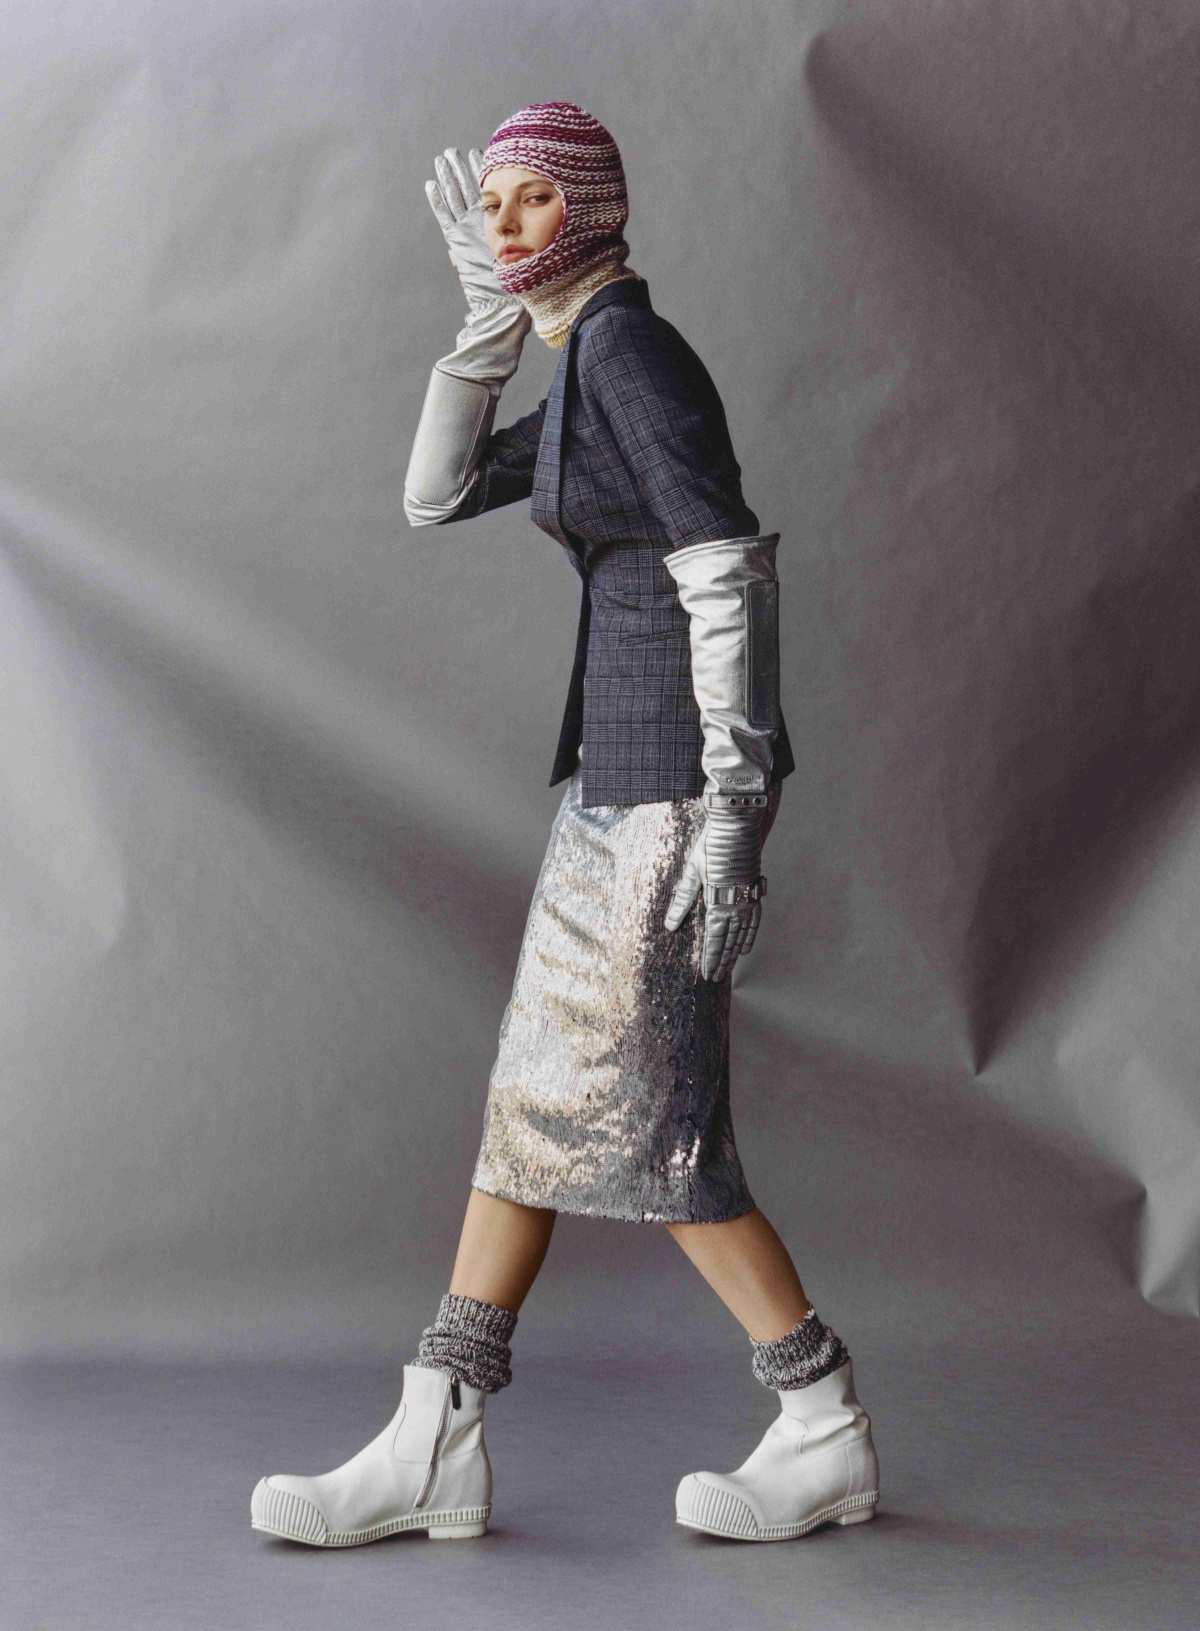 Amanda Murphy Saffron Vadher by Jamie Hawkesworth for Vogue US Oct 2018 (2).jpg